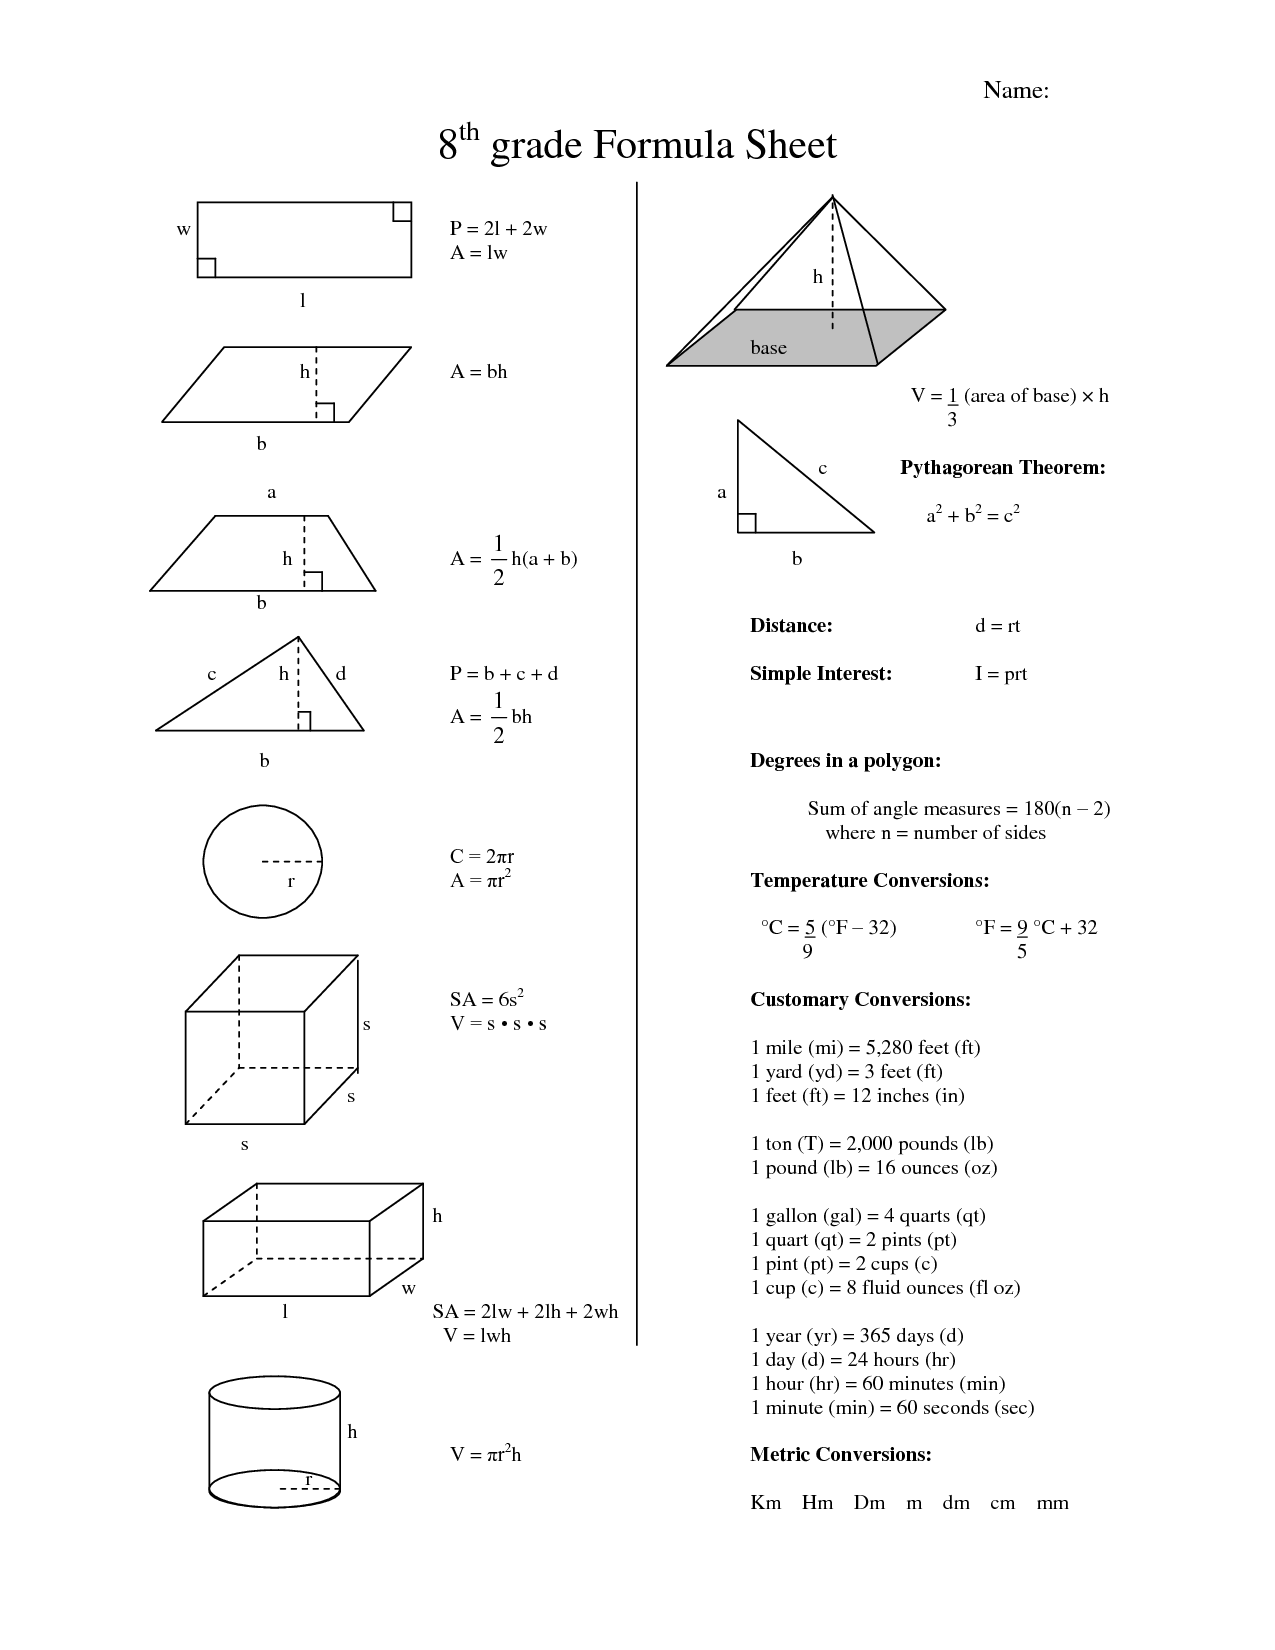 Eighth grade math formula chart 8th grade formula sheet eighth grade math formula chart 8th grade formula sheet robcynllc Choice Image